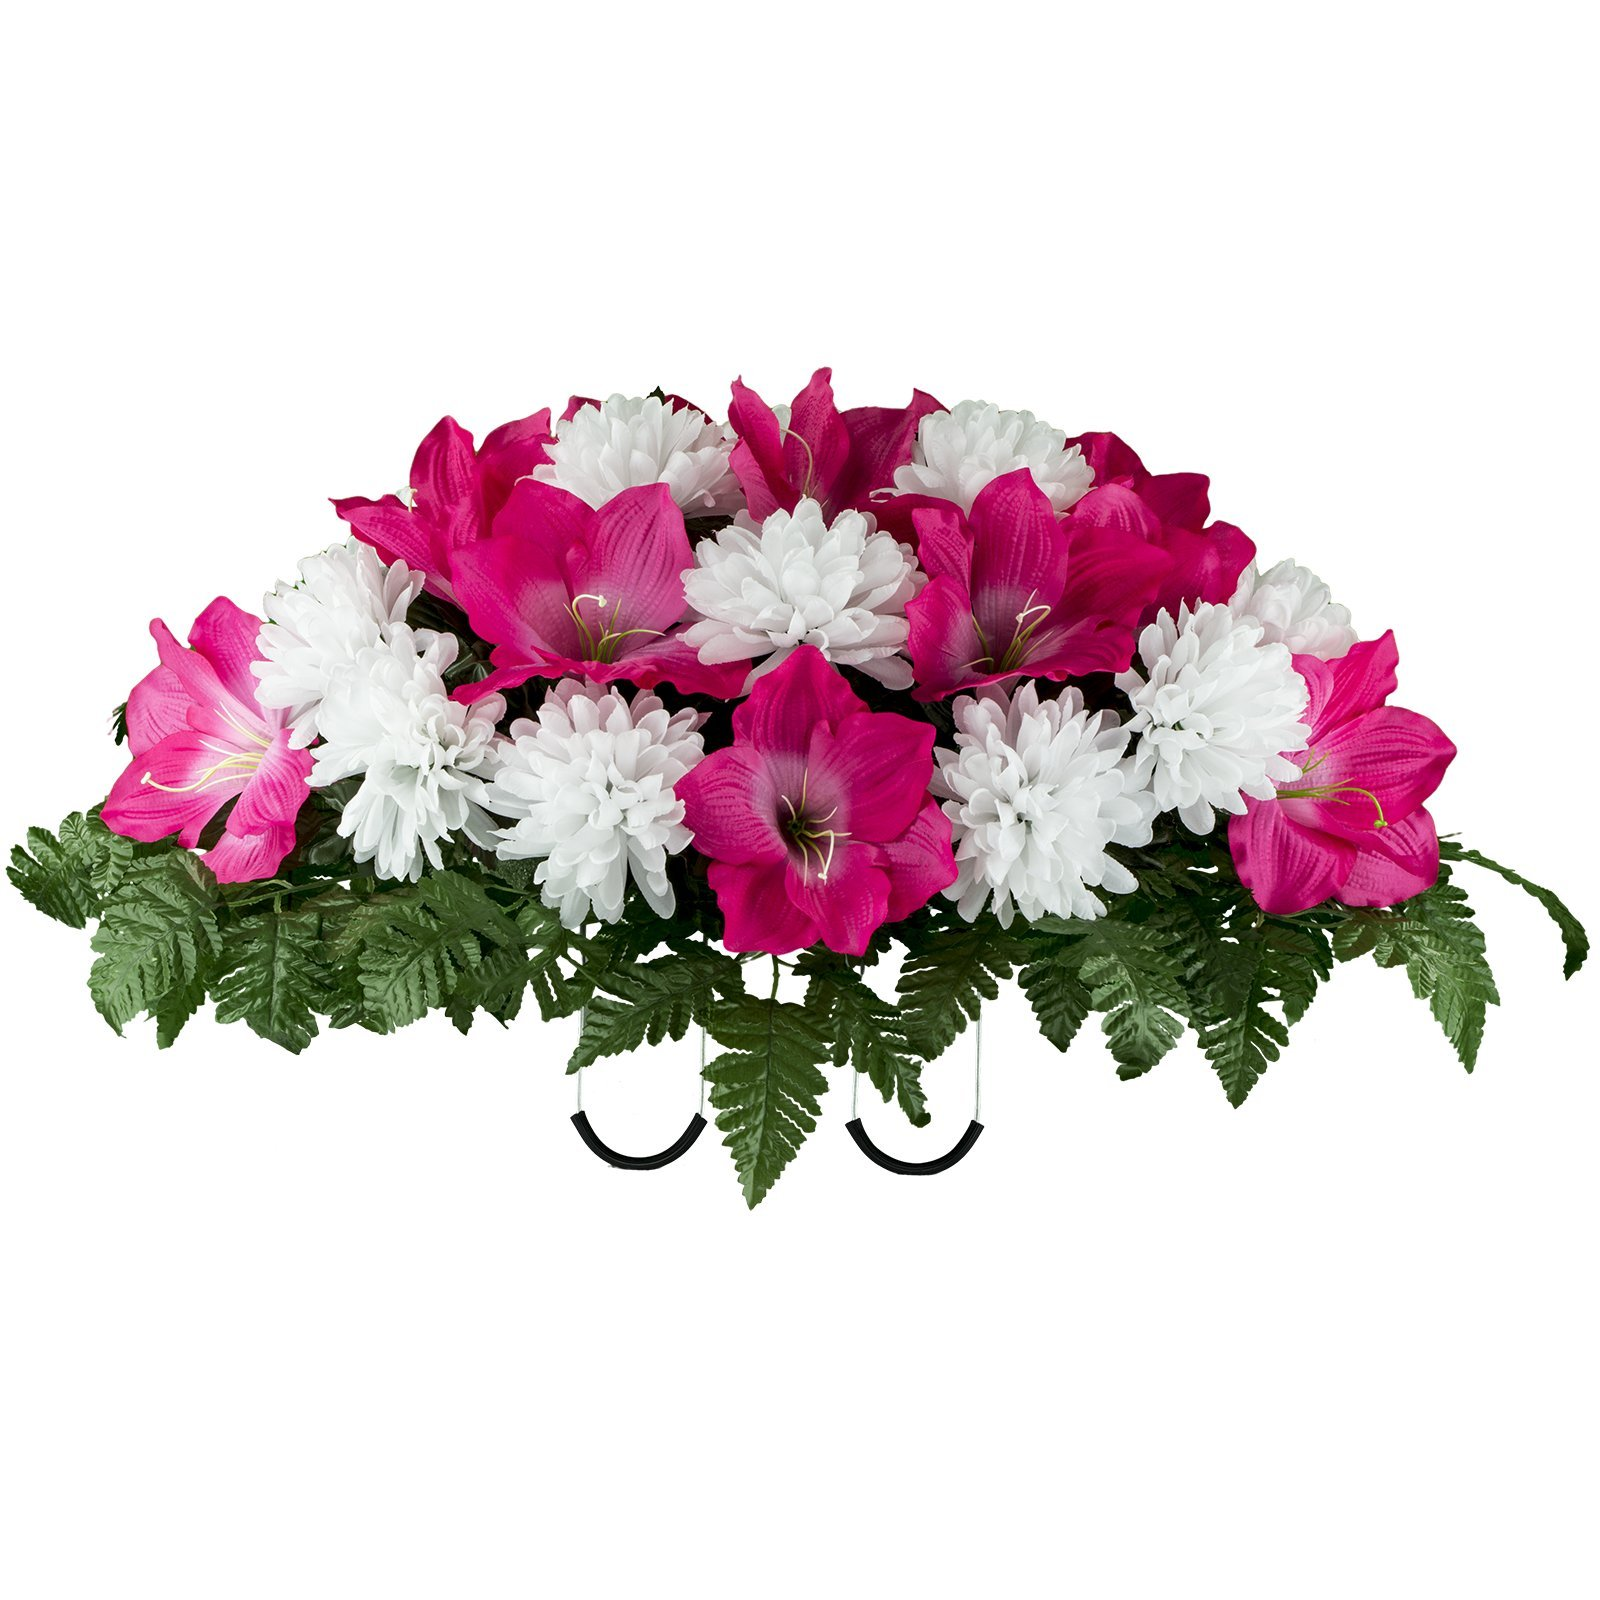 Beauty-Amaryllis-and-White-Mum-Mix-Artificial-Saddle-Arrangement-SD2132